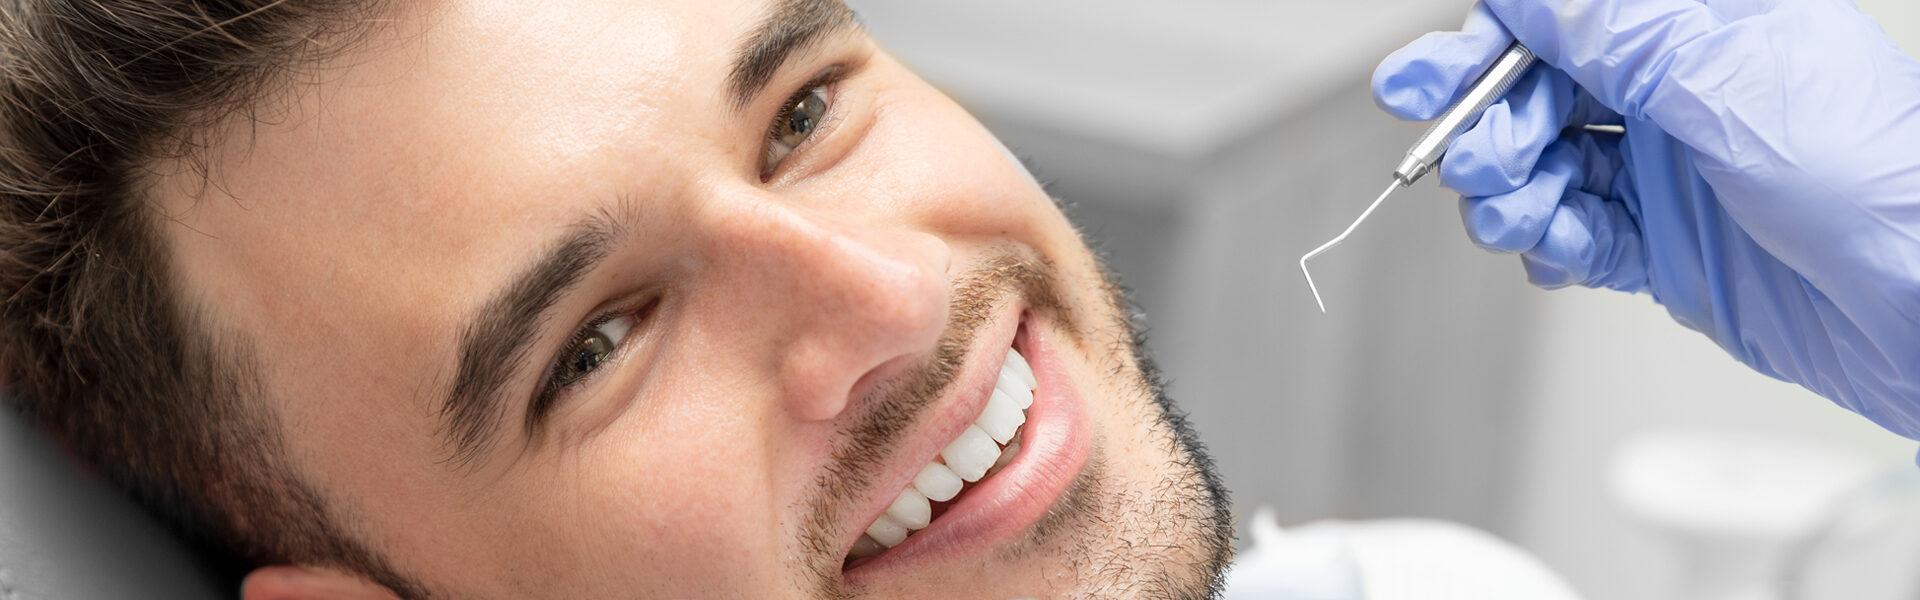 Dental Crowns in Auburn, WA - Crowns Near You